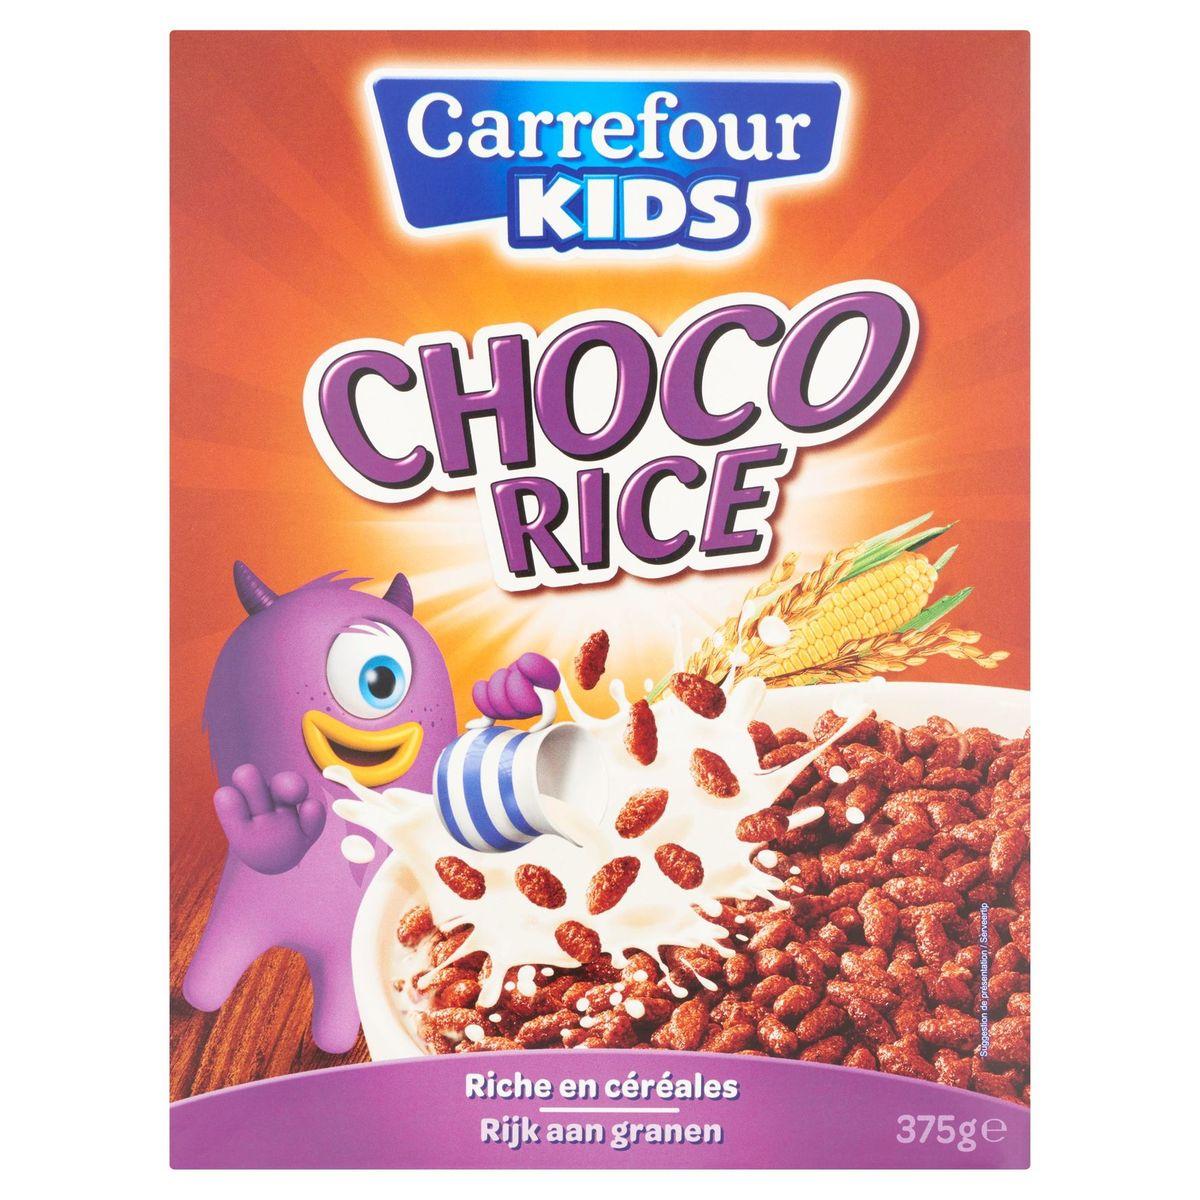 Carrefour Kids Choco Rice 375 g